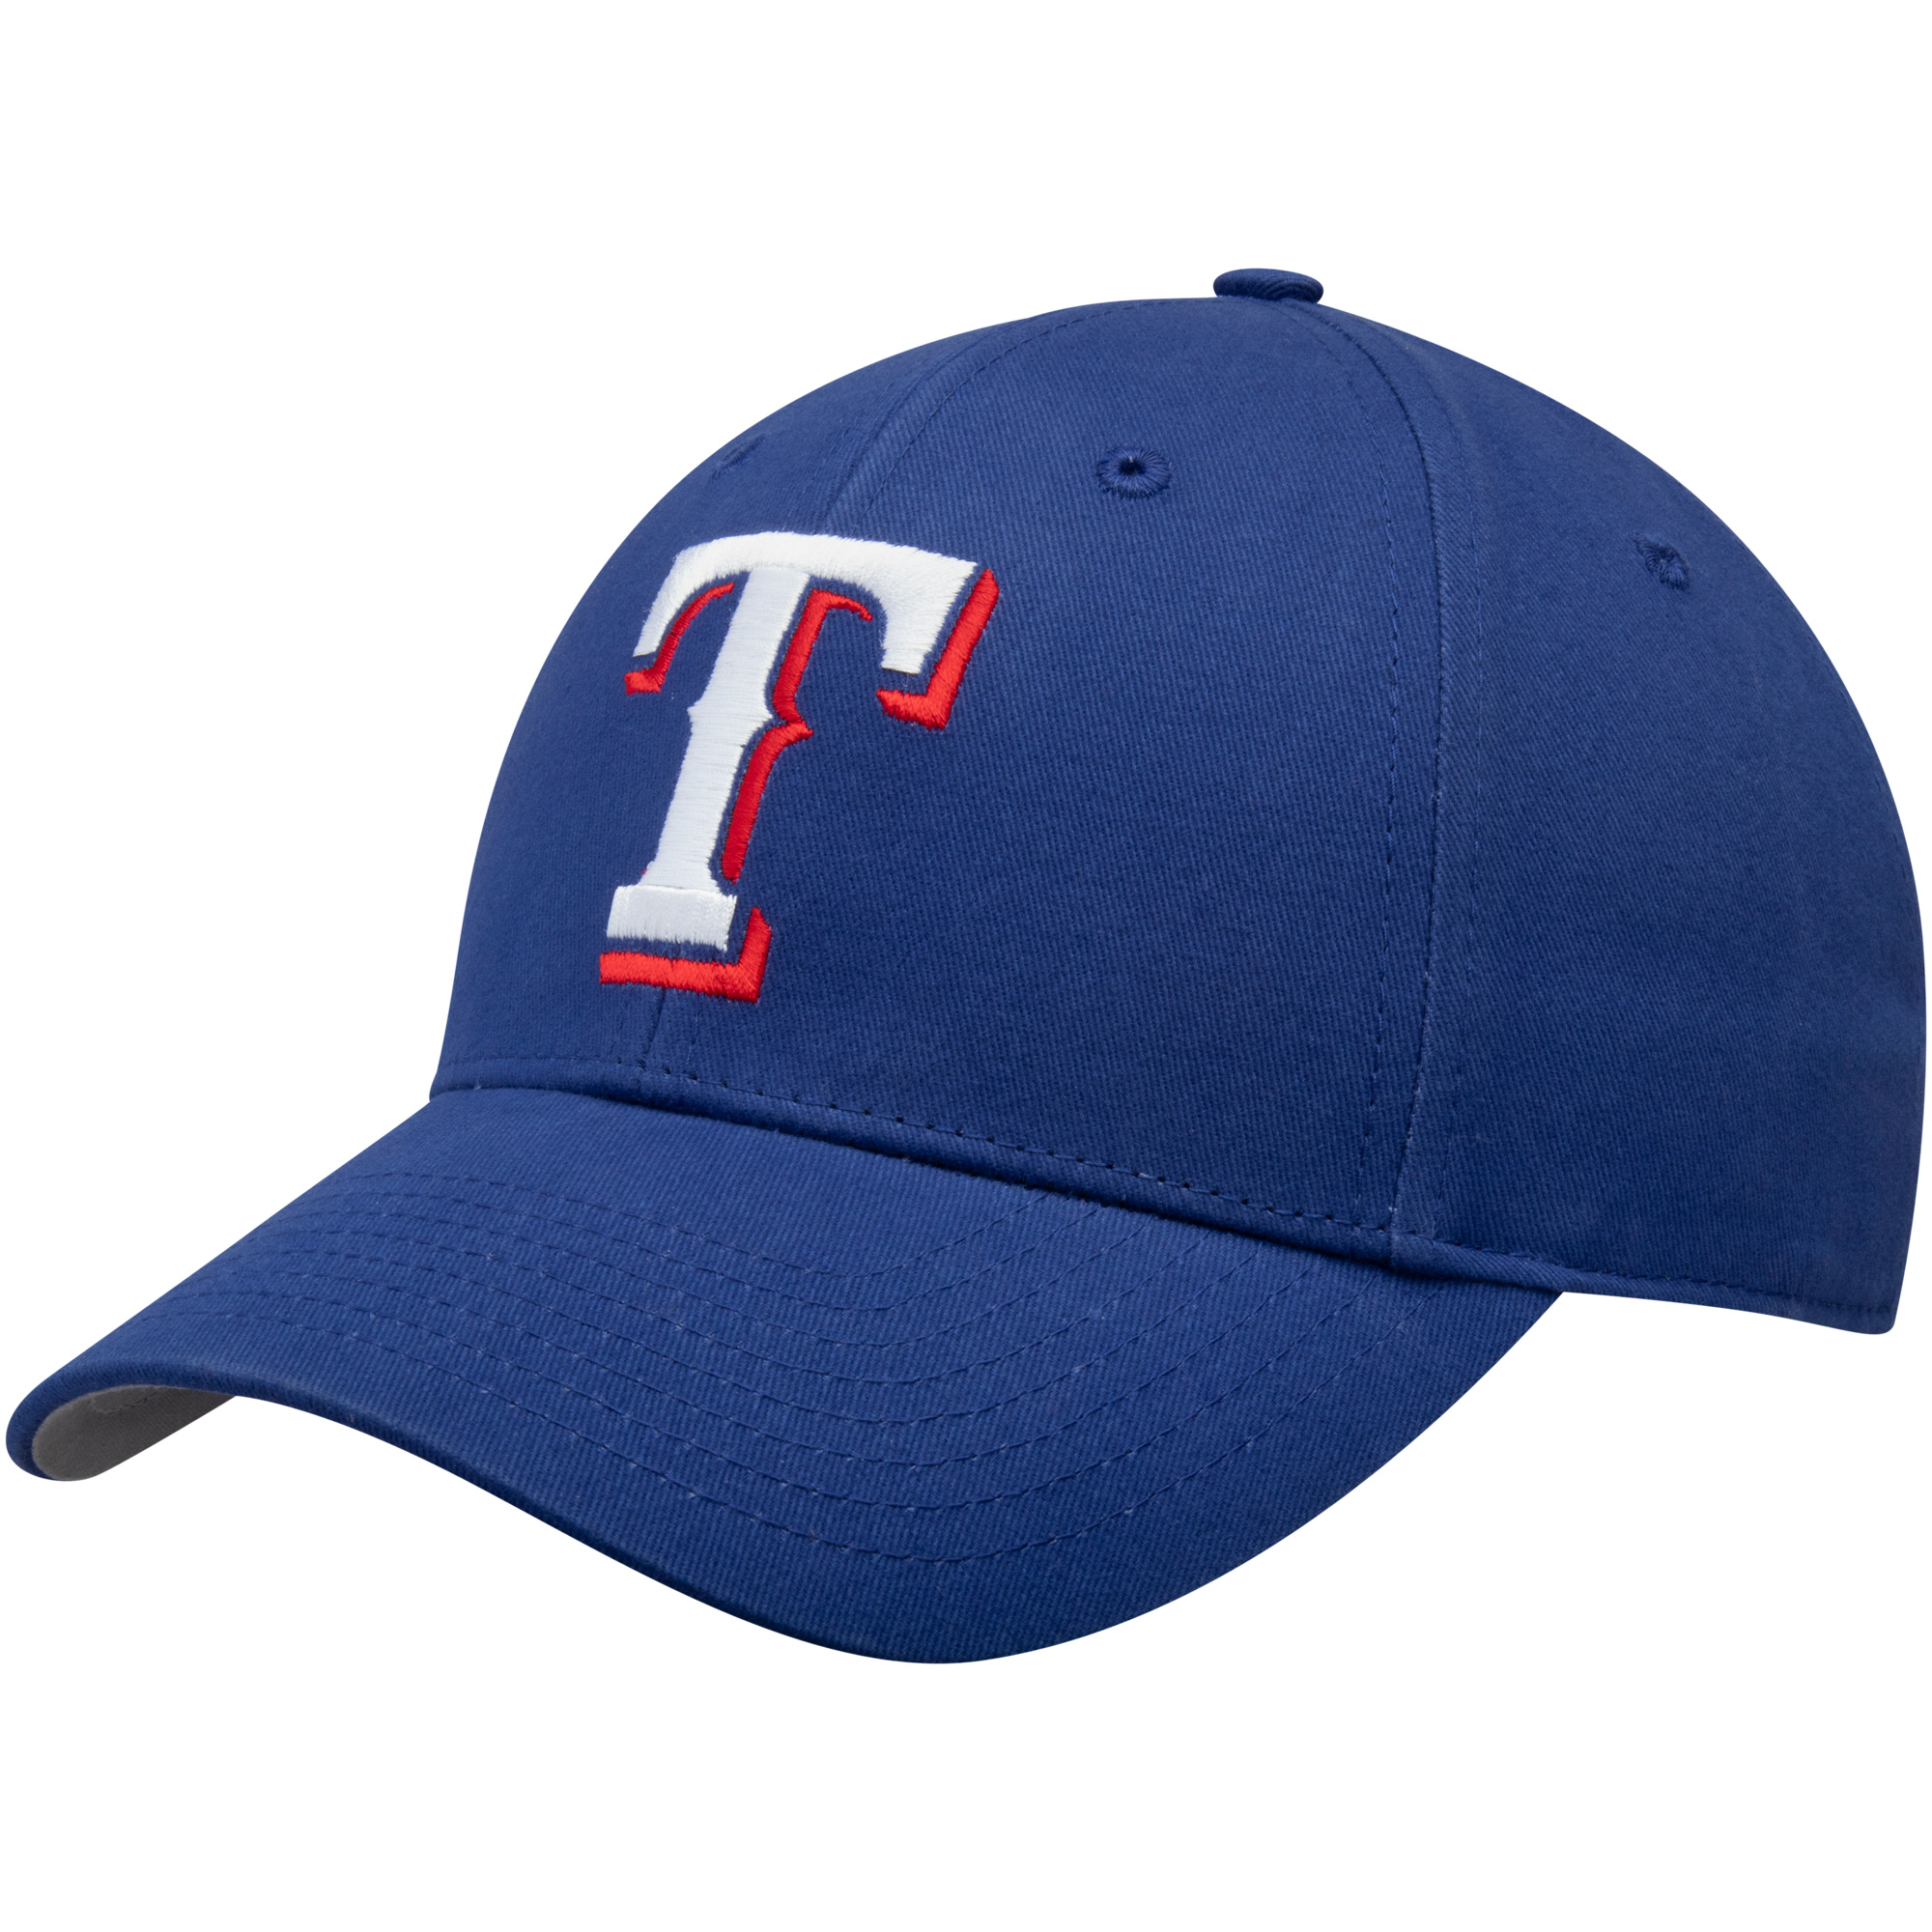 premium selection 1bb16 6e495 MLB Texas Rangers Basic Cap   Hat by Fan Favorite - Walmart.com